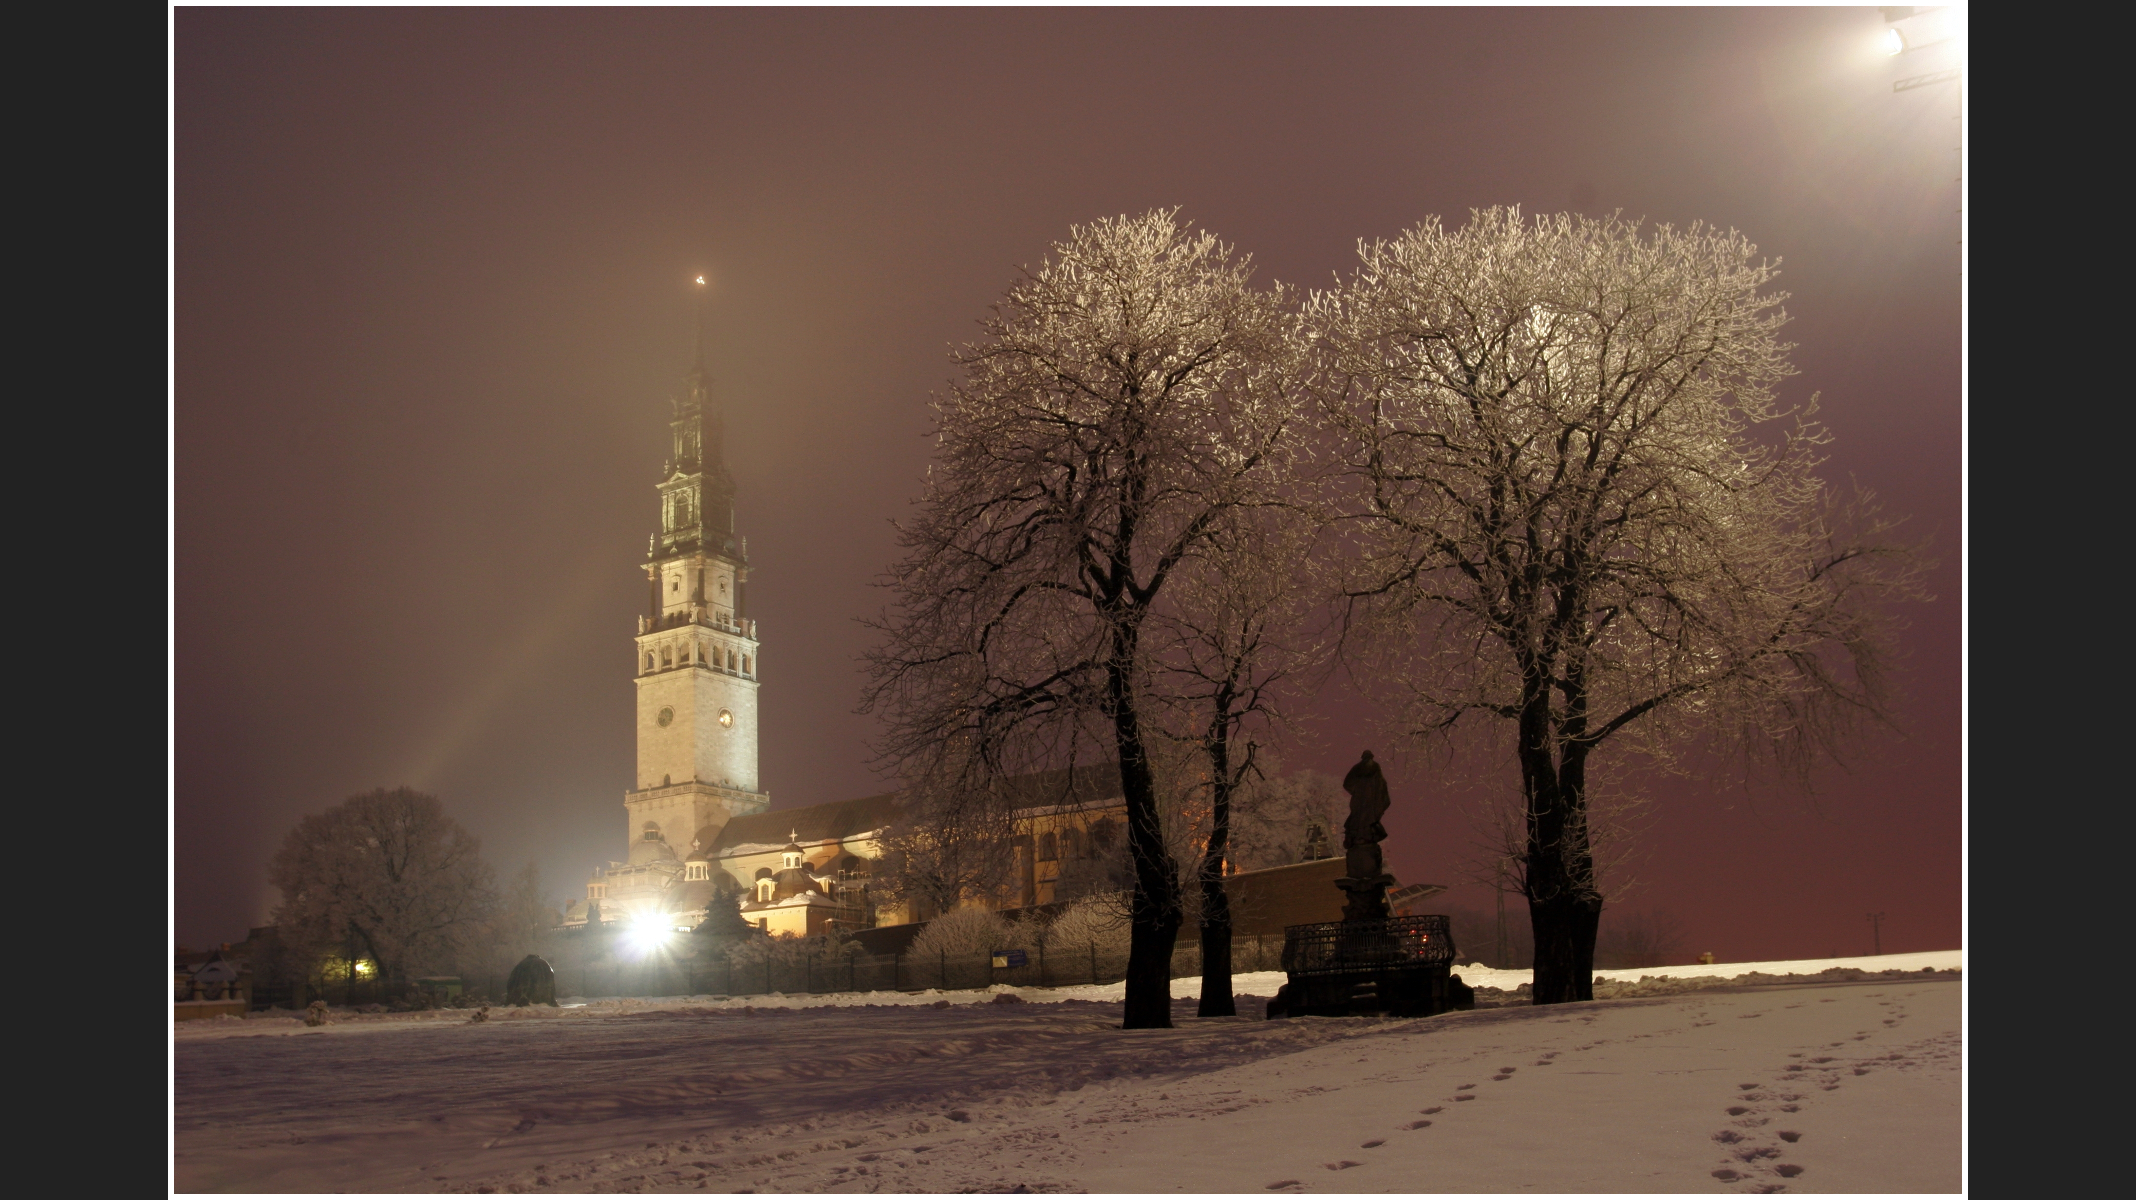 Photo by: Rafal Jablonski